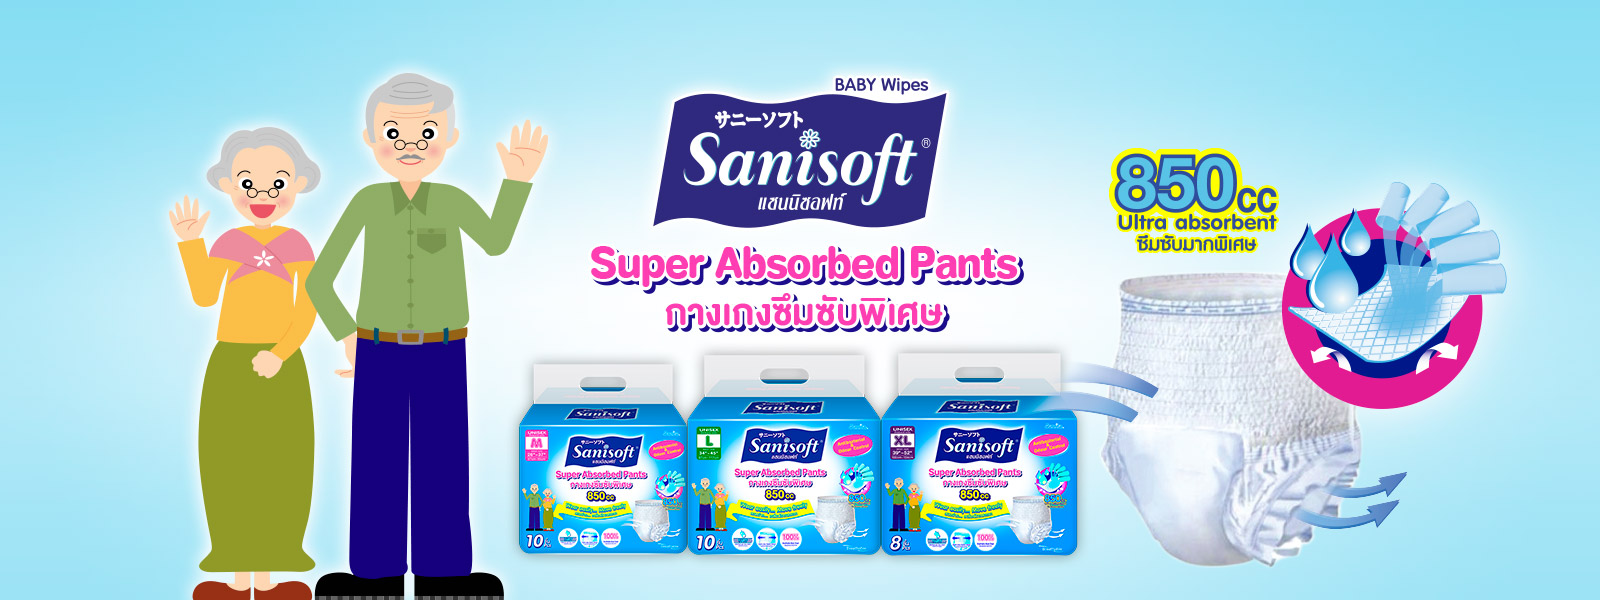 sanisoft แซนนิซอฟท์ ผ้าอ้อมผู้ใหญ่ adult pants แบบกางเกง